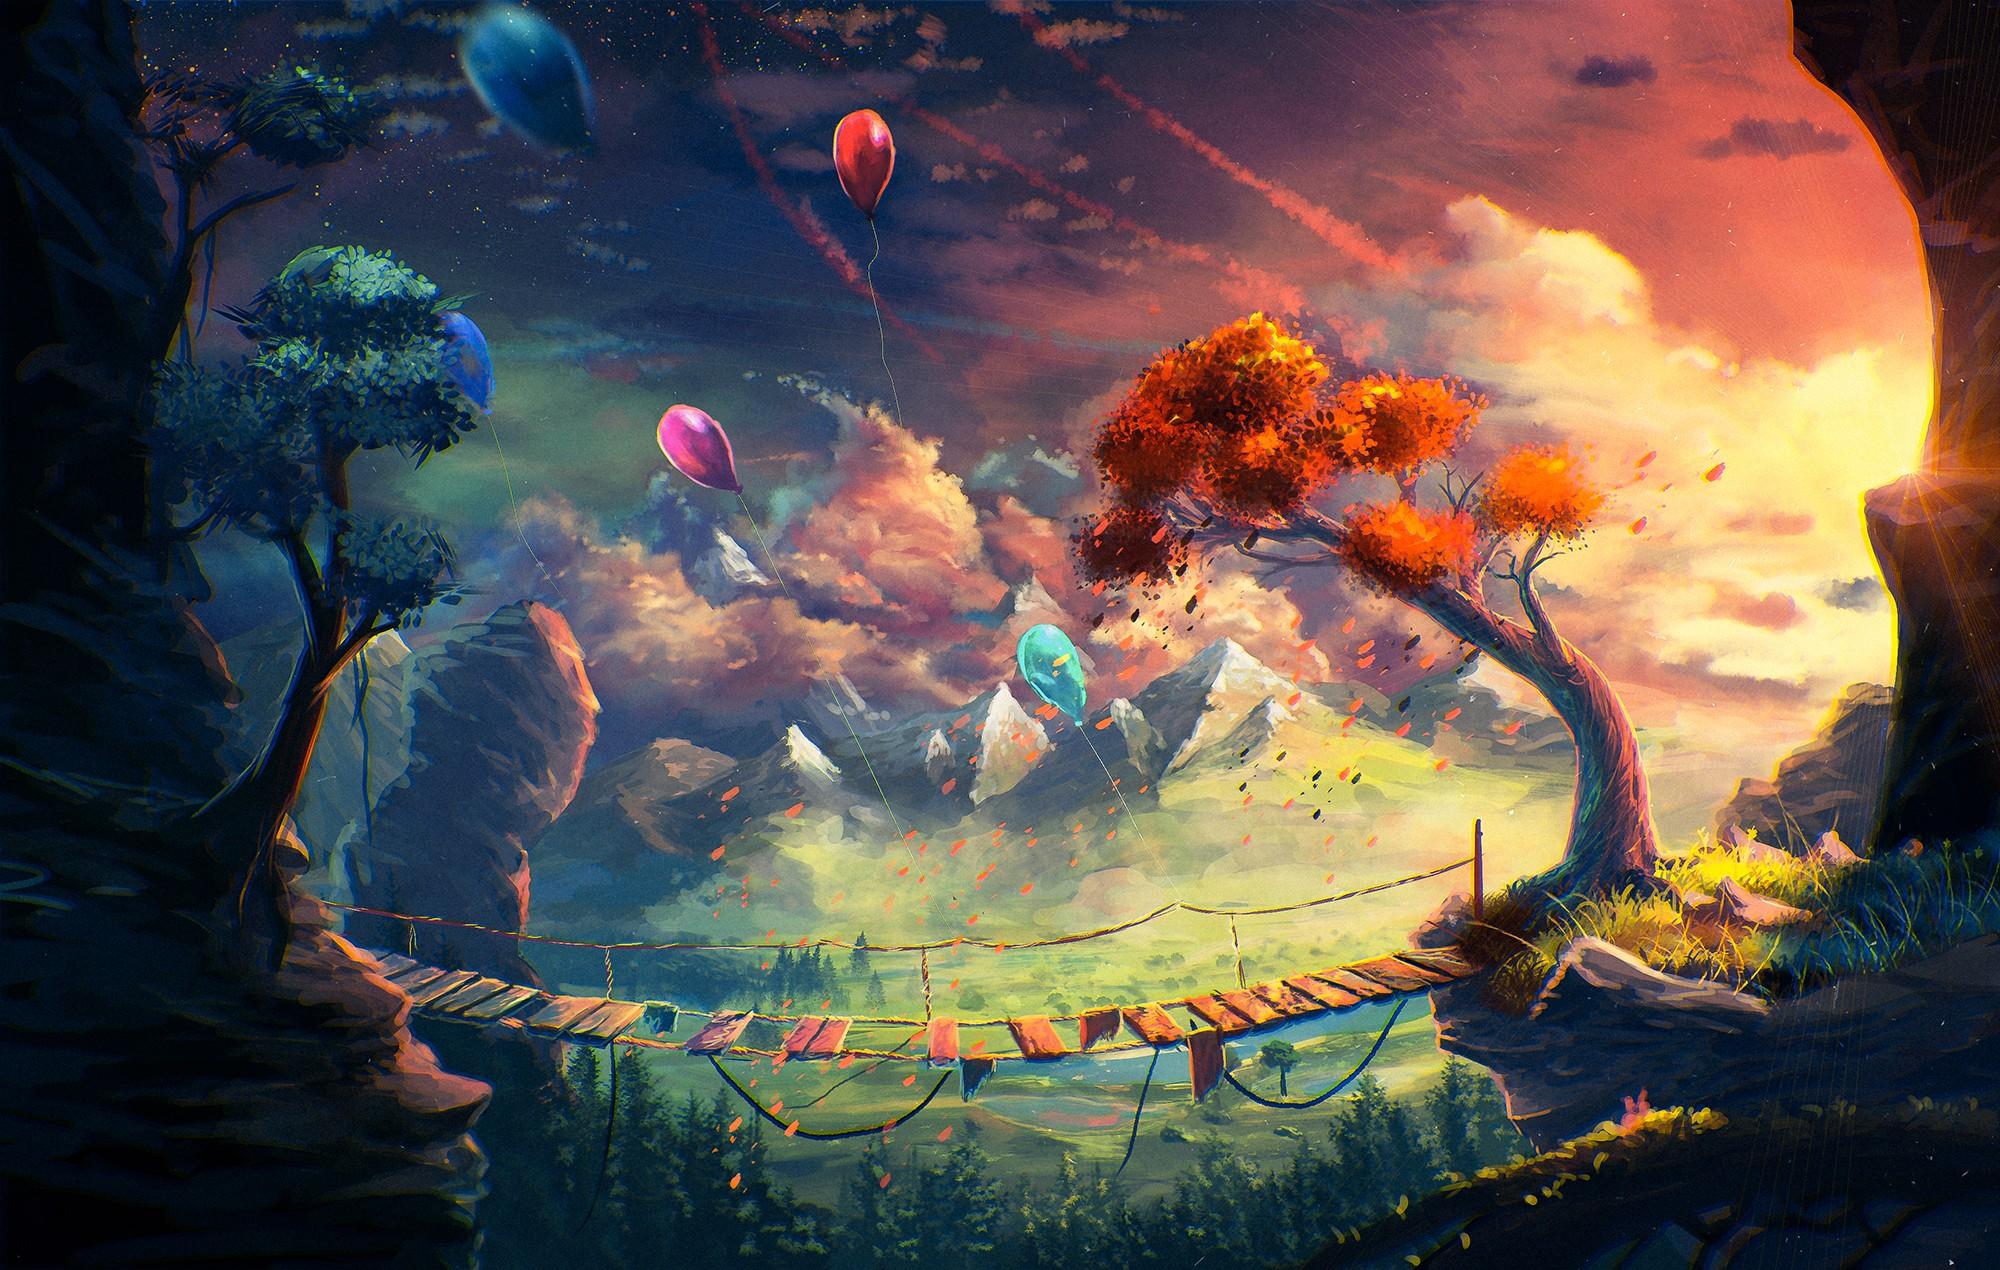 General 2000x1270 anime artwork fantasy art mountains bridge balloon Sylar clouds